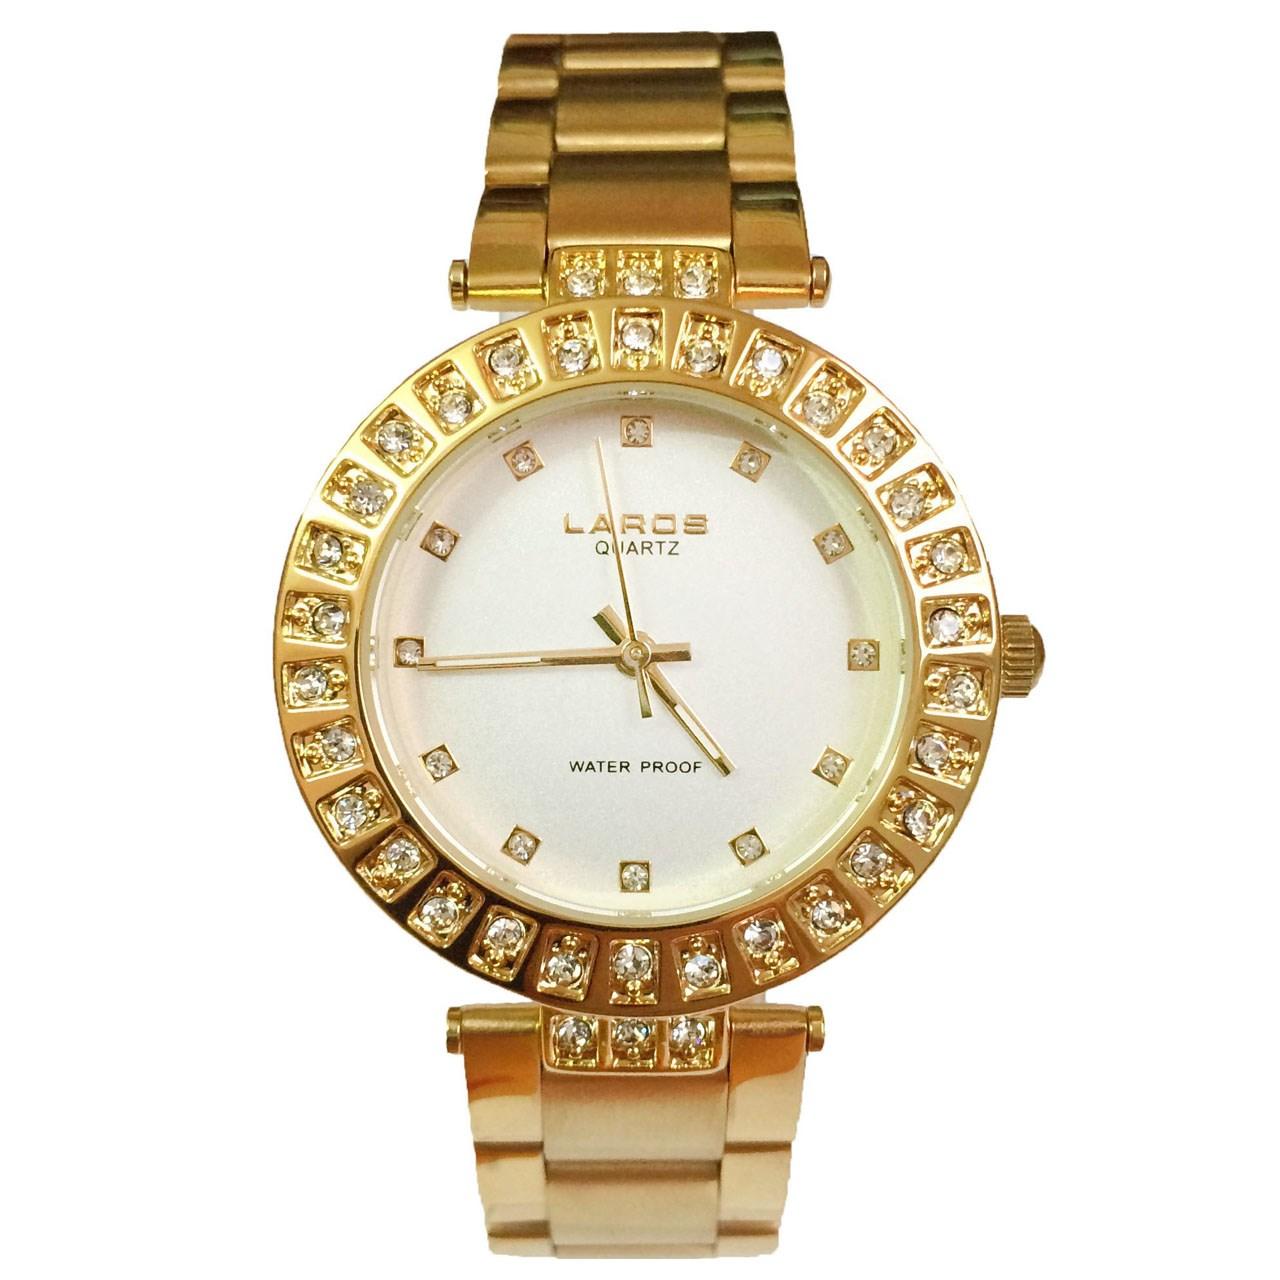 ساعت زنانه برند لاروس مدل No 0917-80088